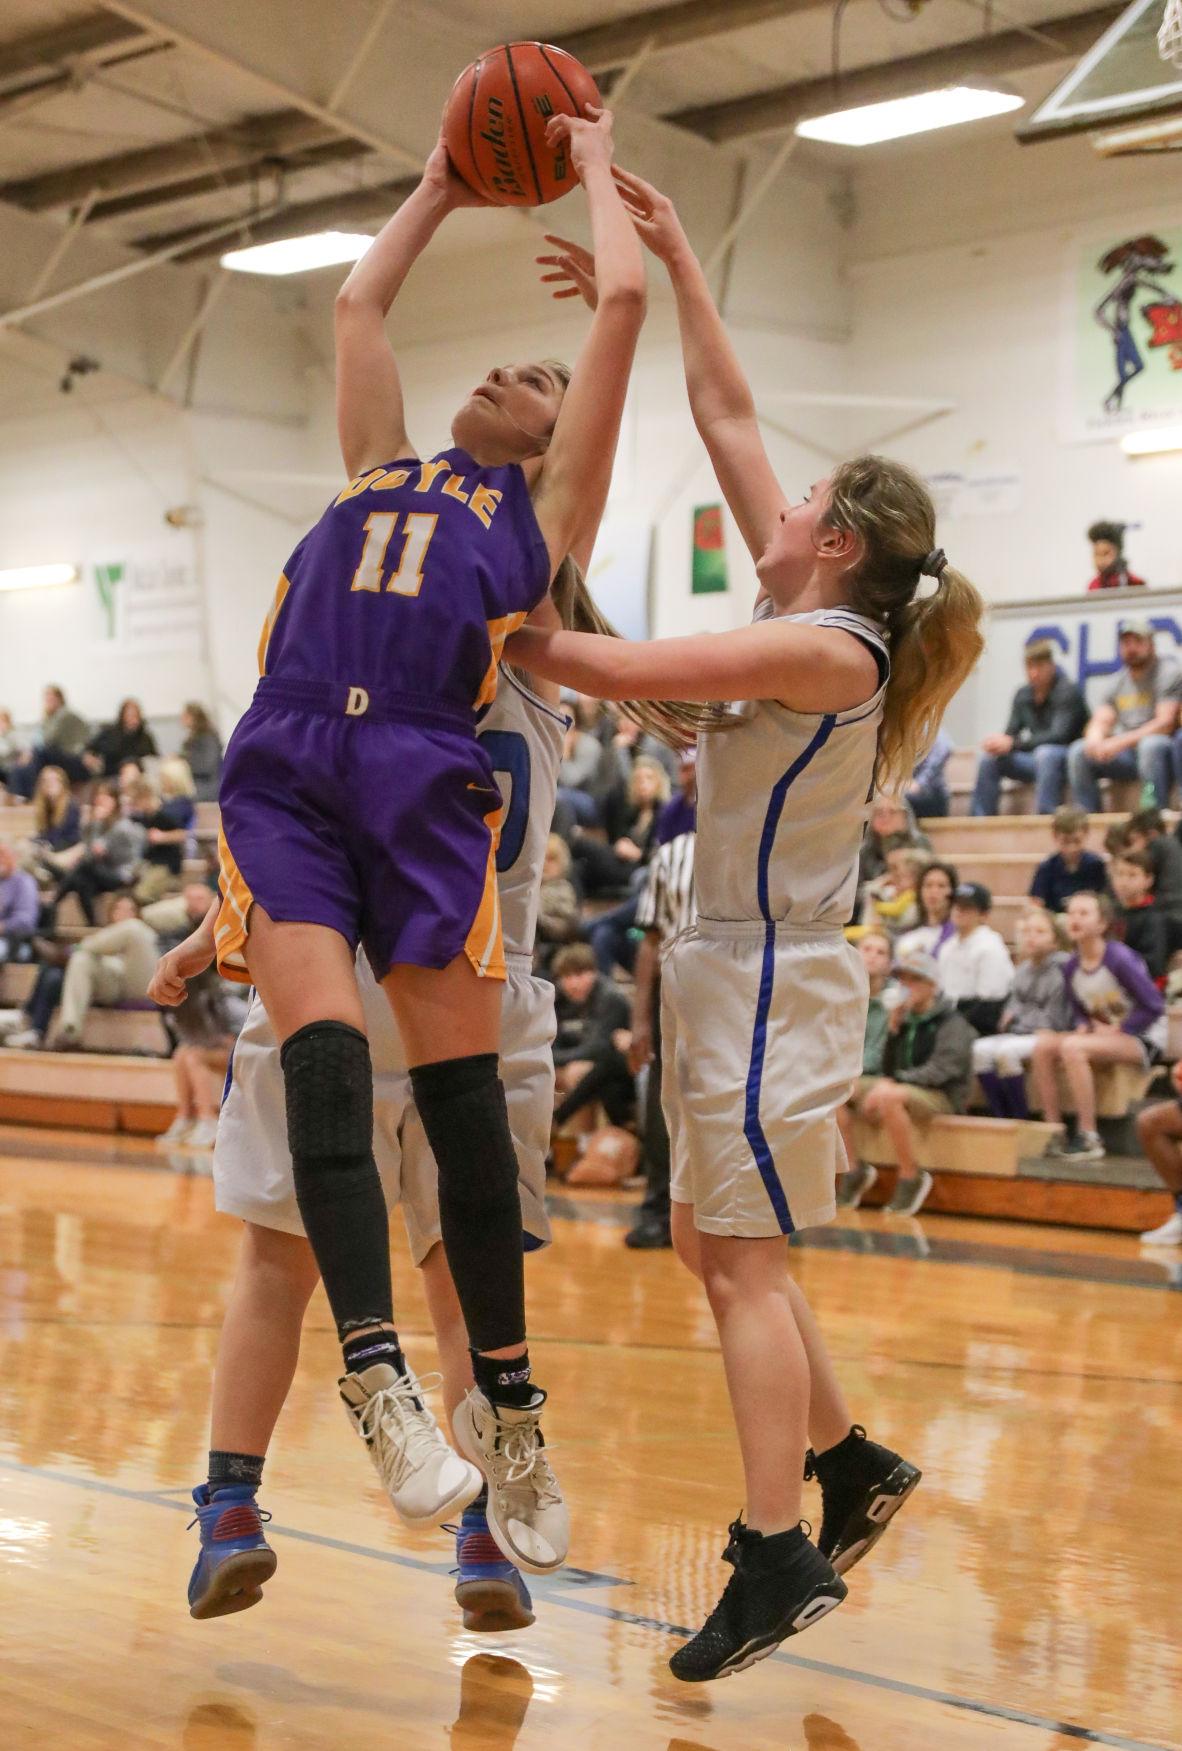 Doyle at Springsfield girls basketball Presleigh Scott Lori Martin